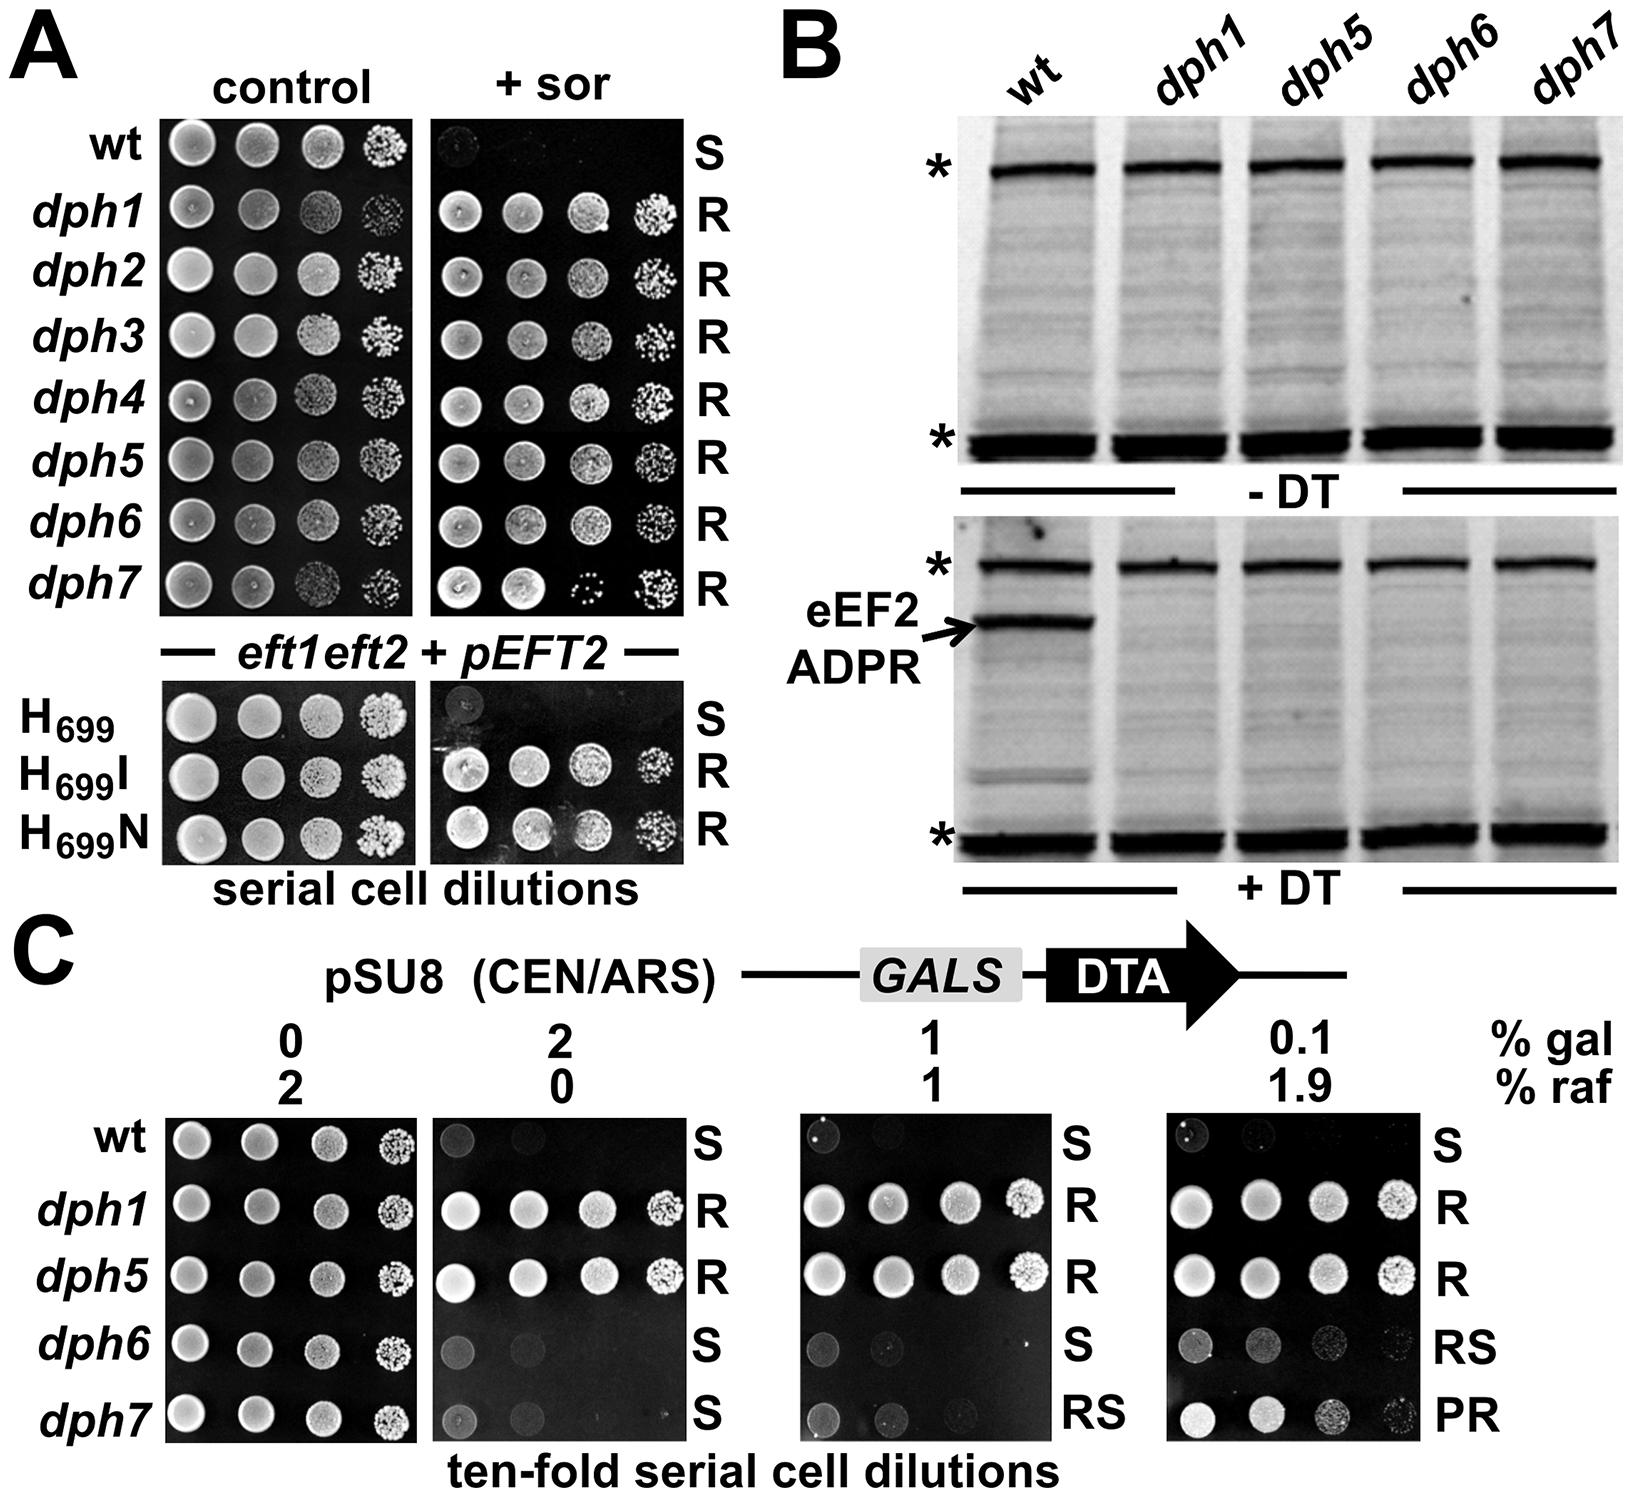 <i>DPH6</i> and <i>DPH7</i> deletion strains copy traits typically related to the <i>bona fide</i> diphthamide mutants <i>dph1-dph5</i>.